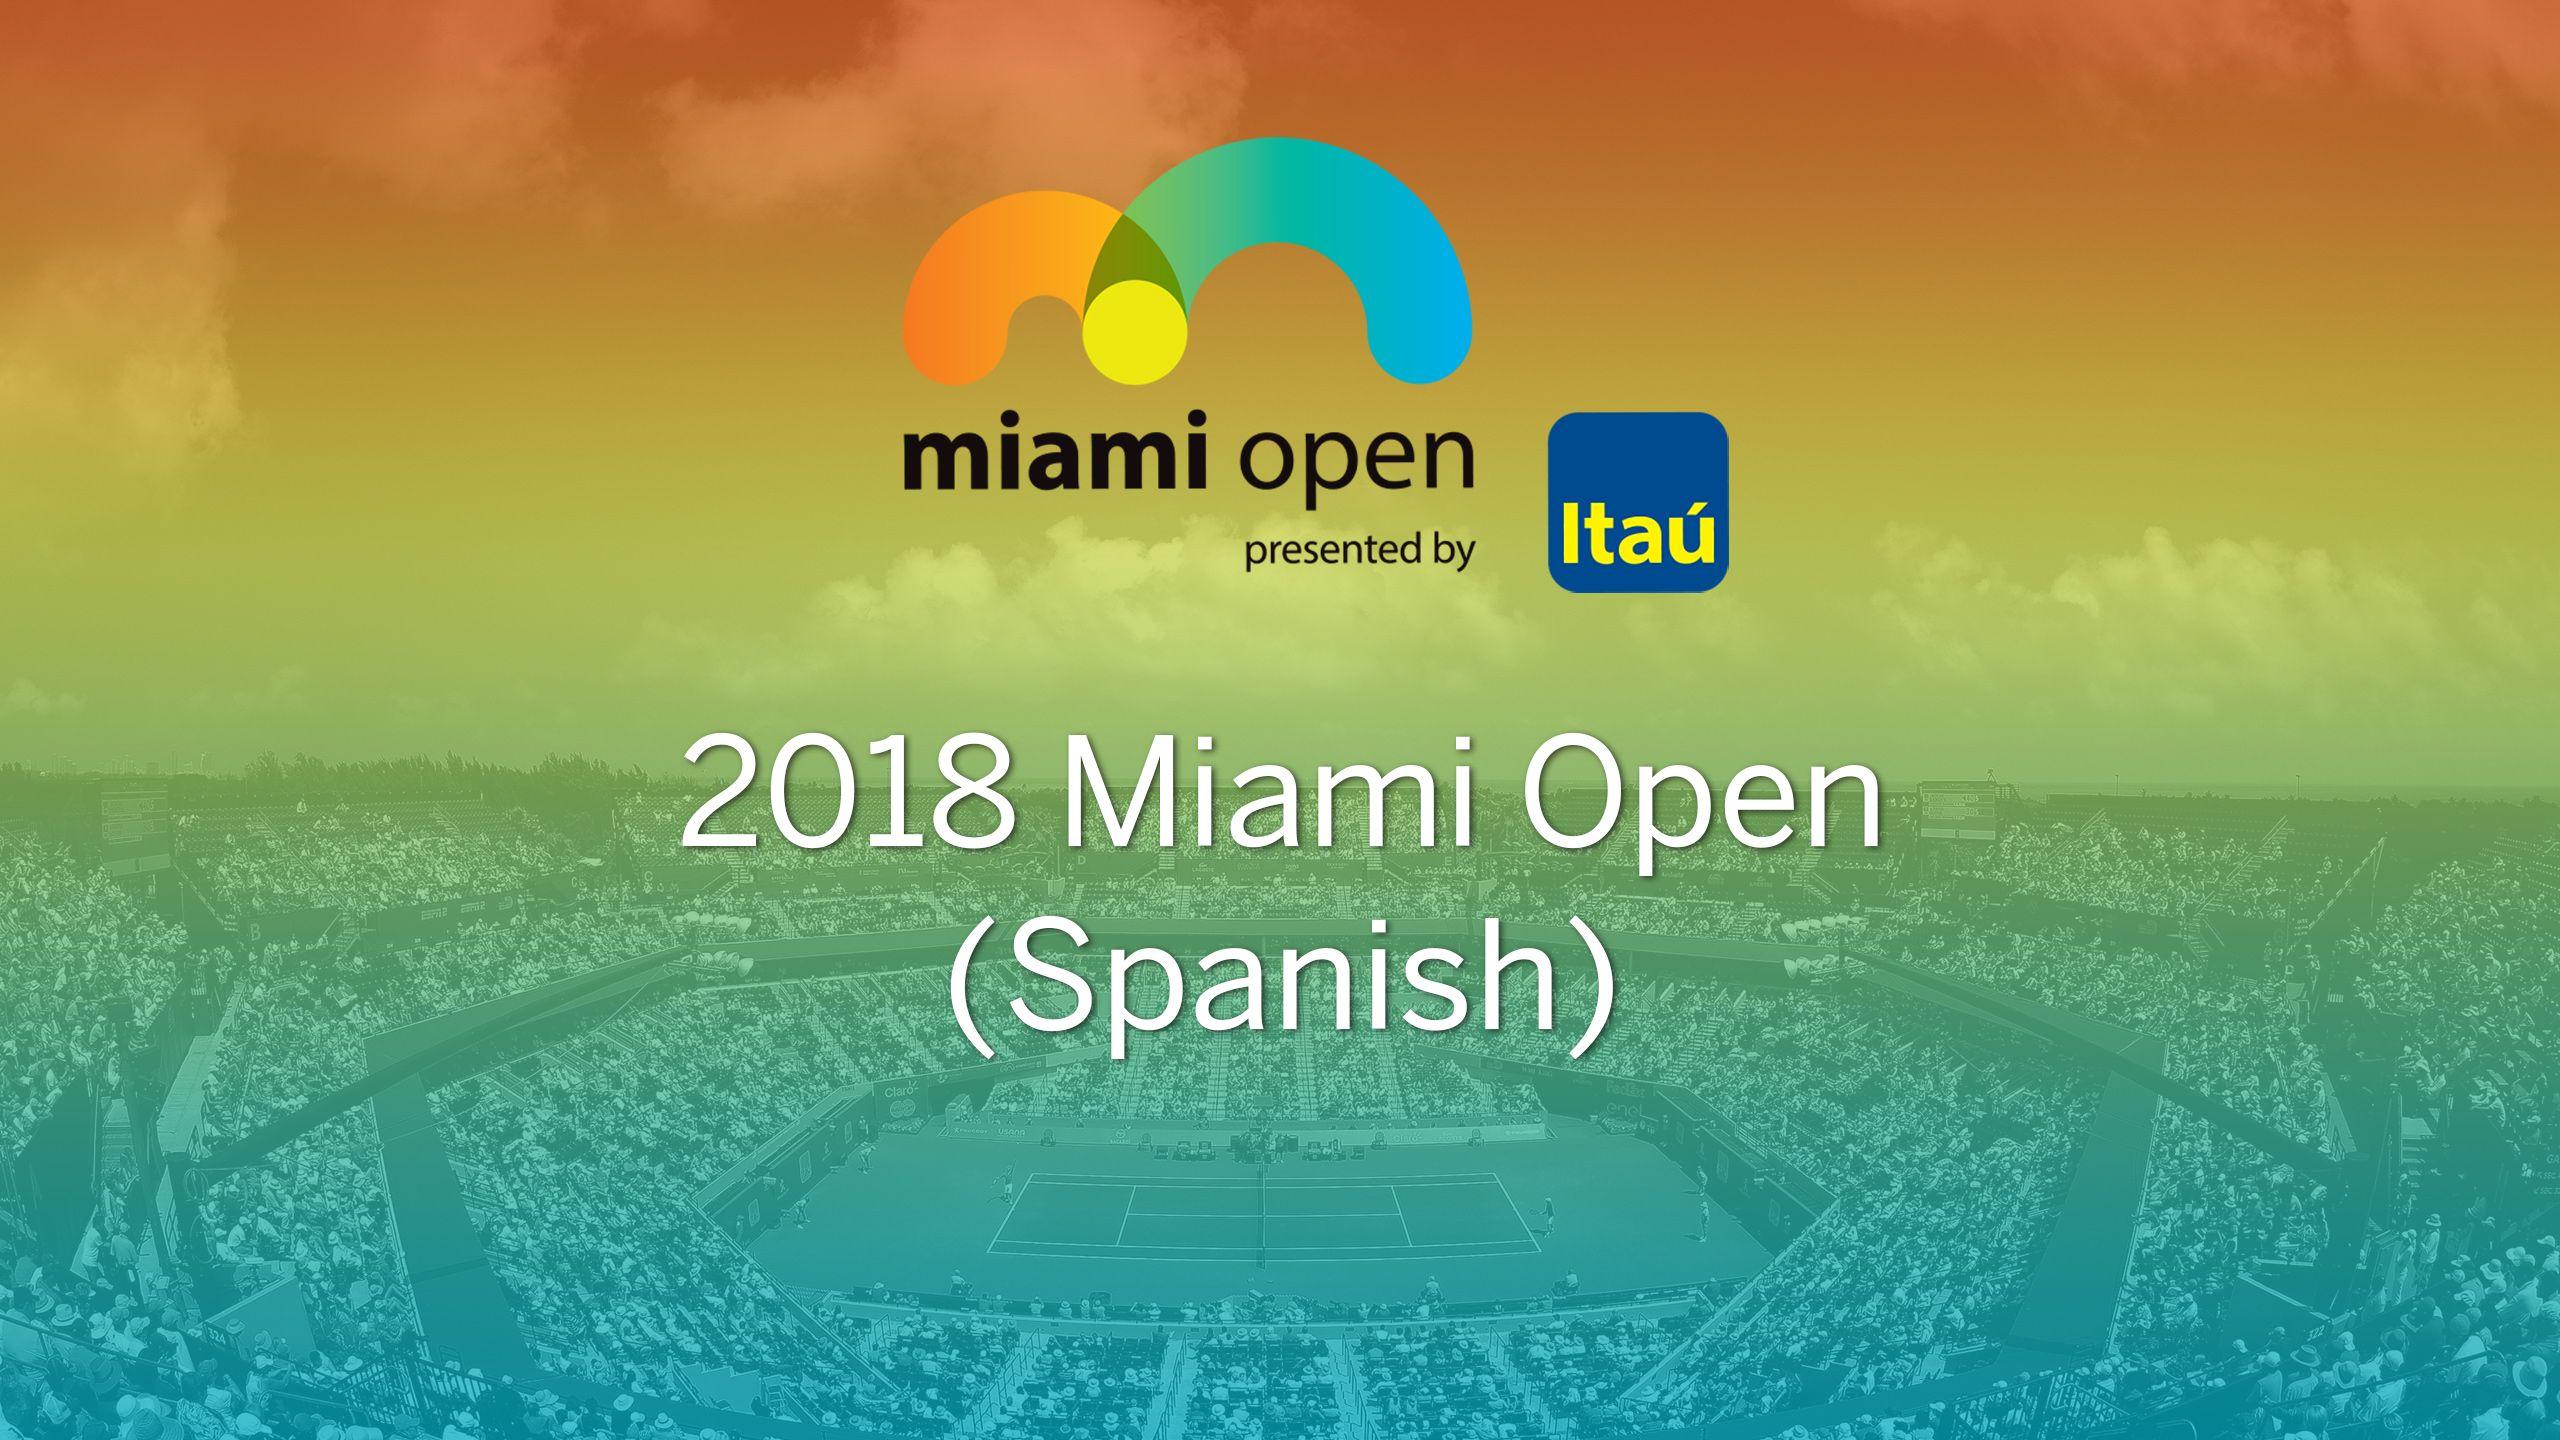 In Spanish - Miami Open (Second Round)